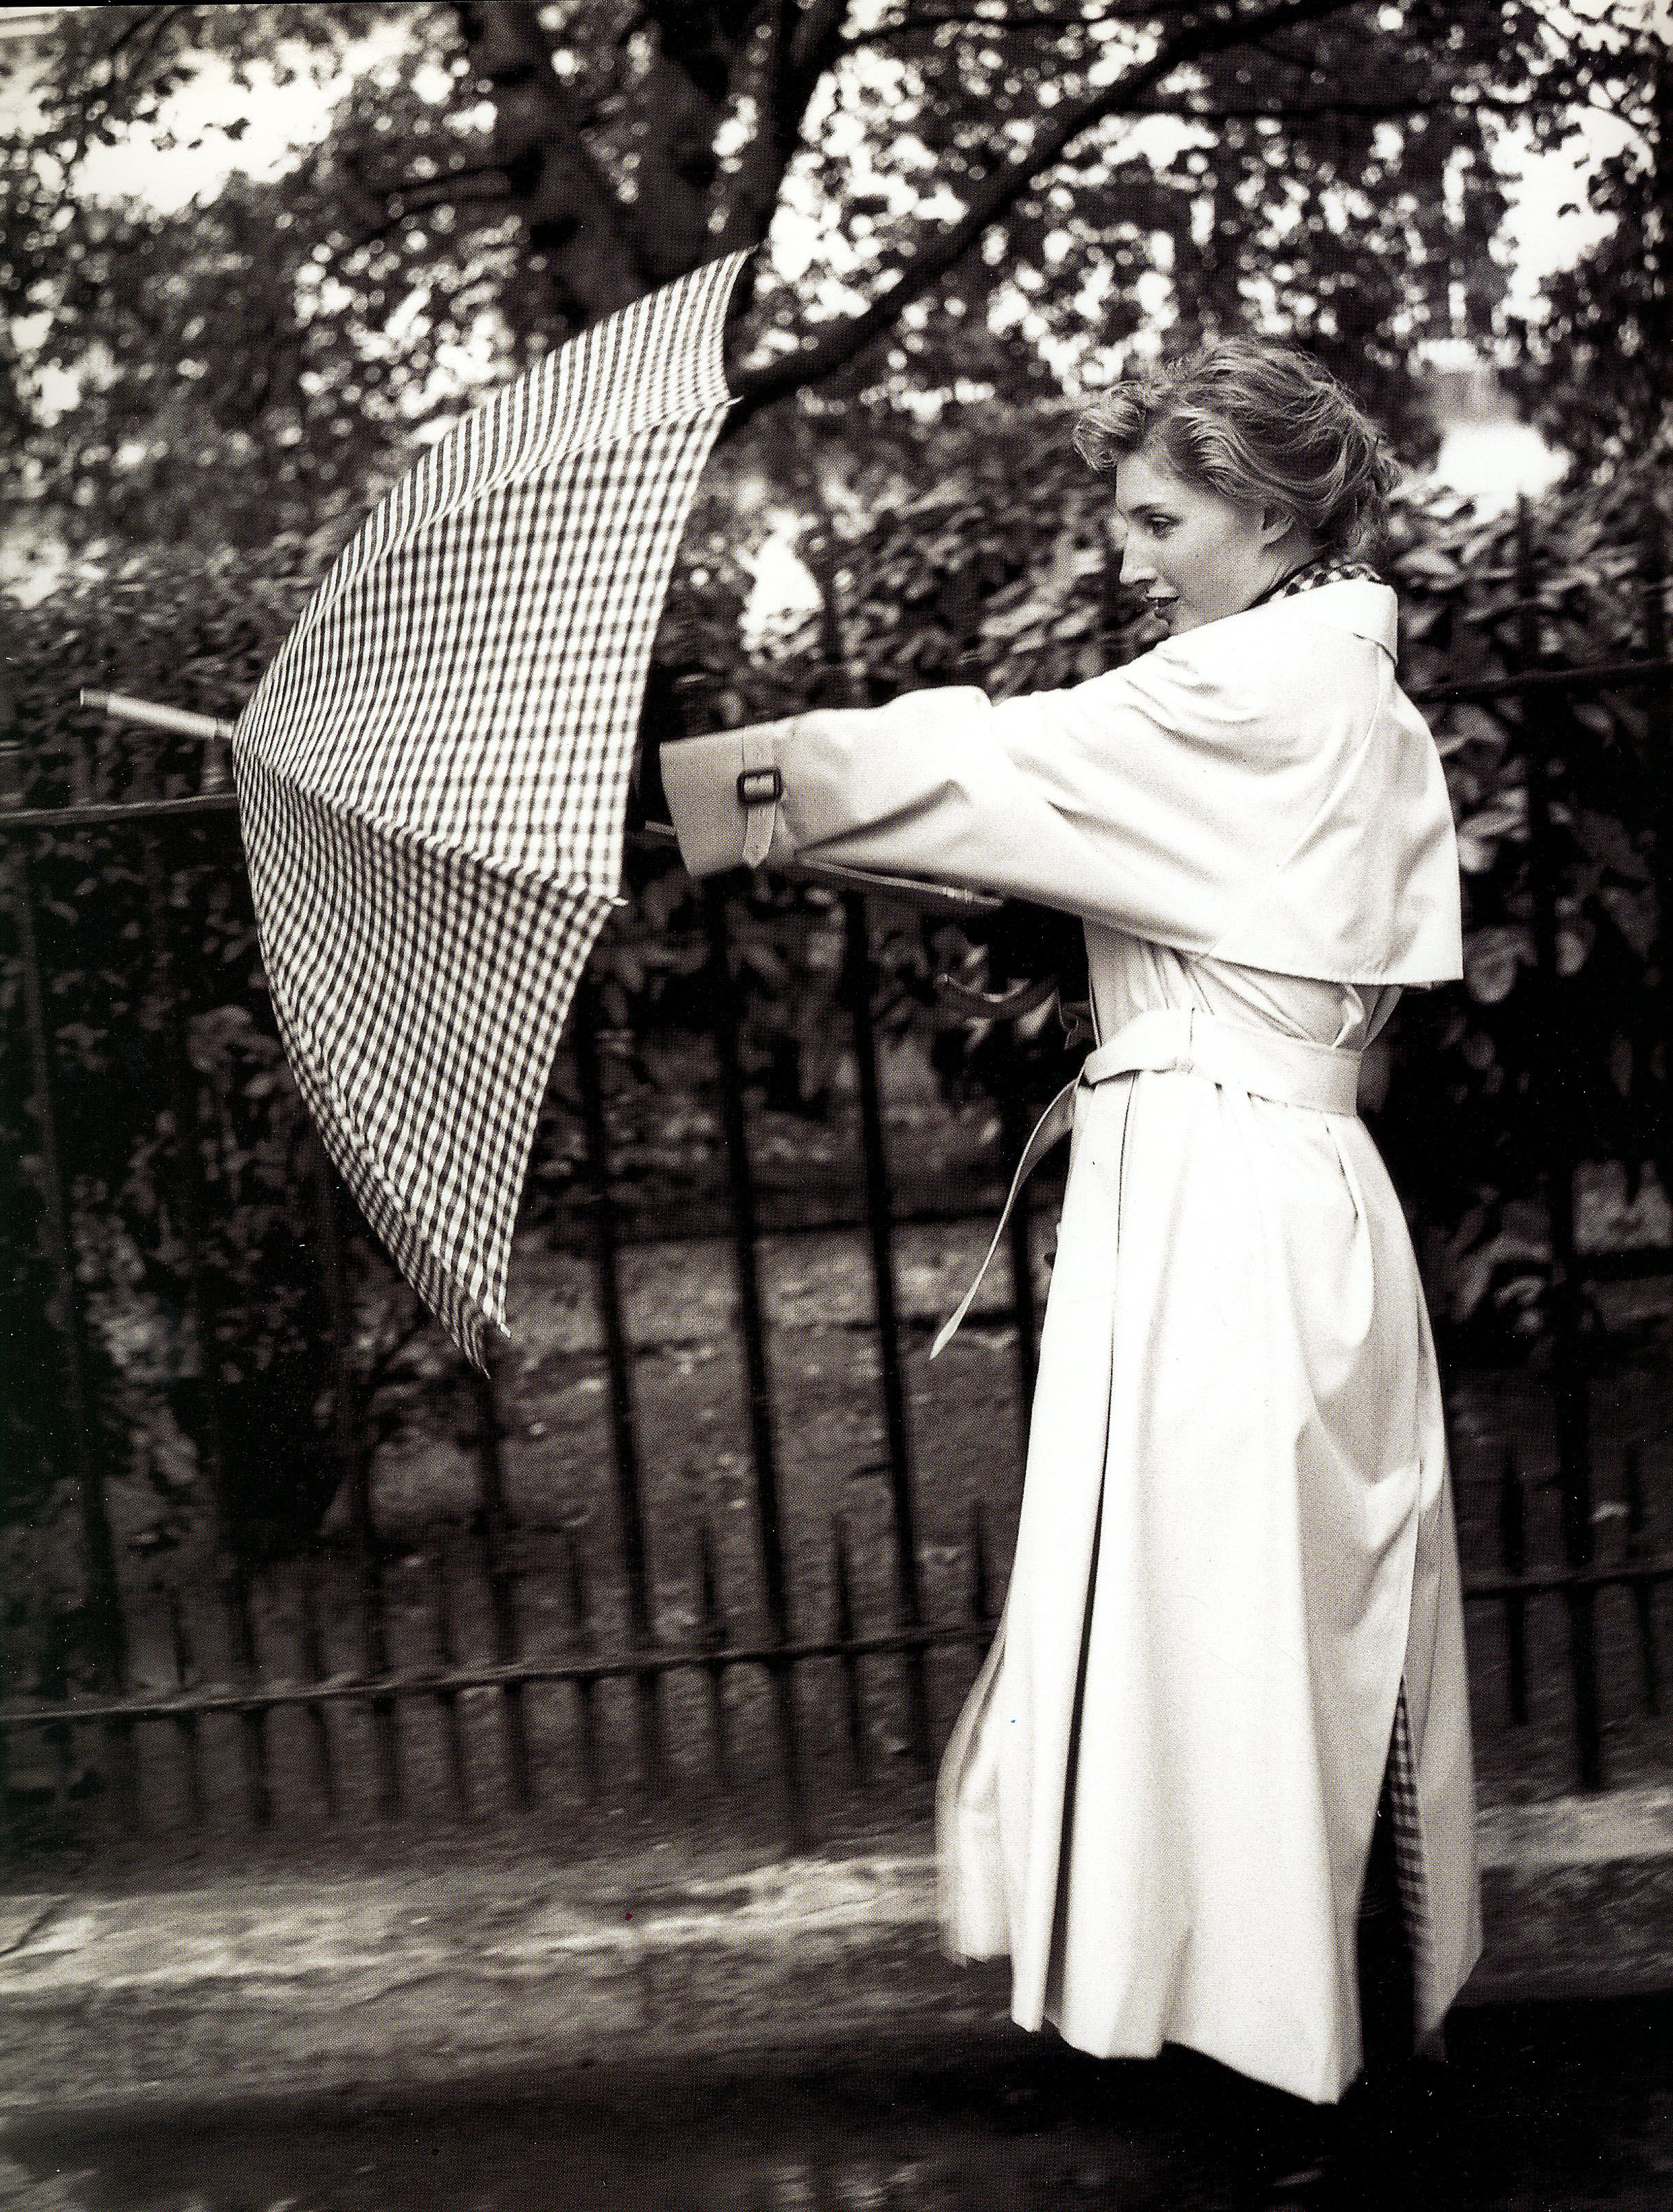 raincoated girls   cape-fashion.de   mobolo14   Flickr